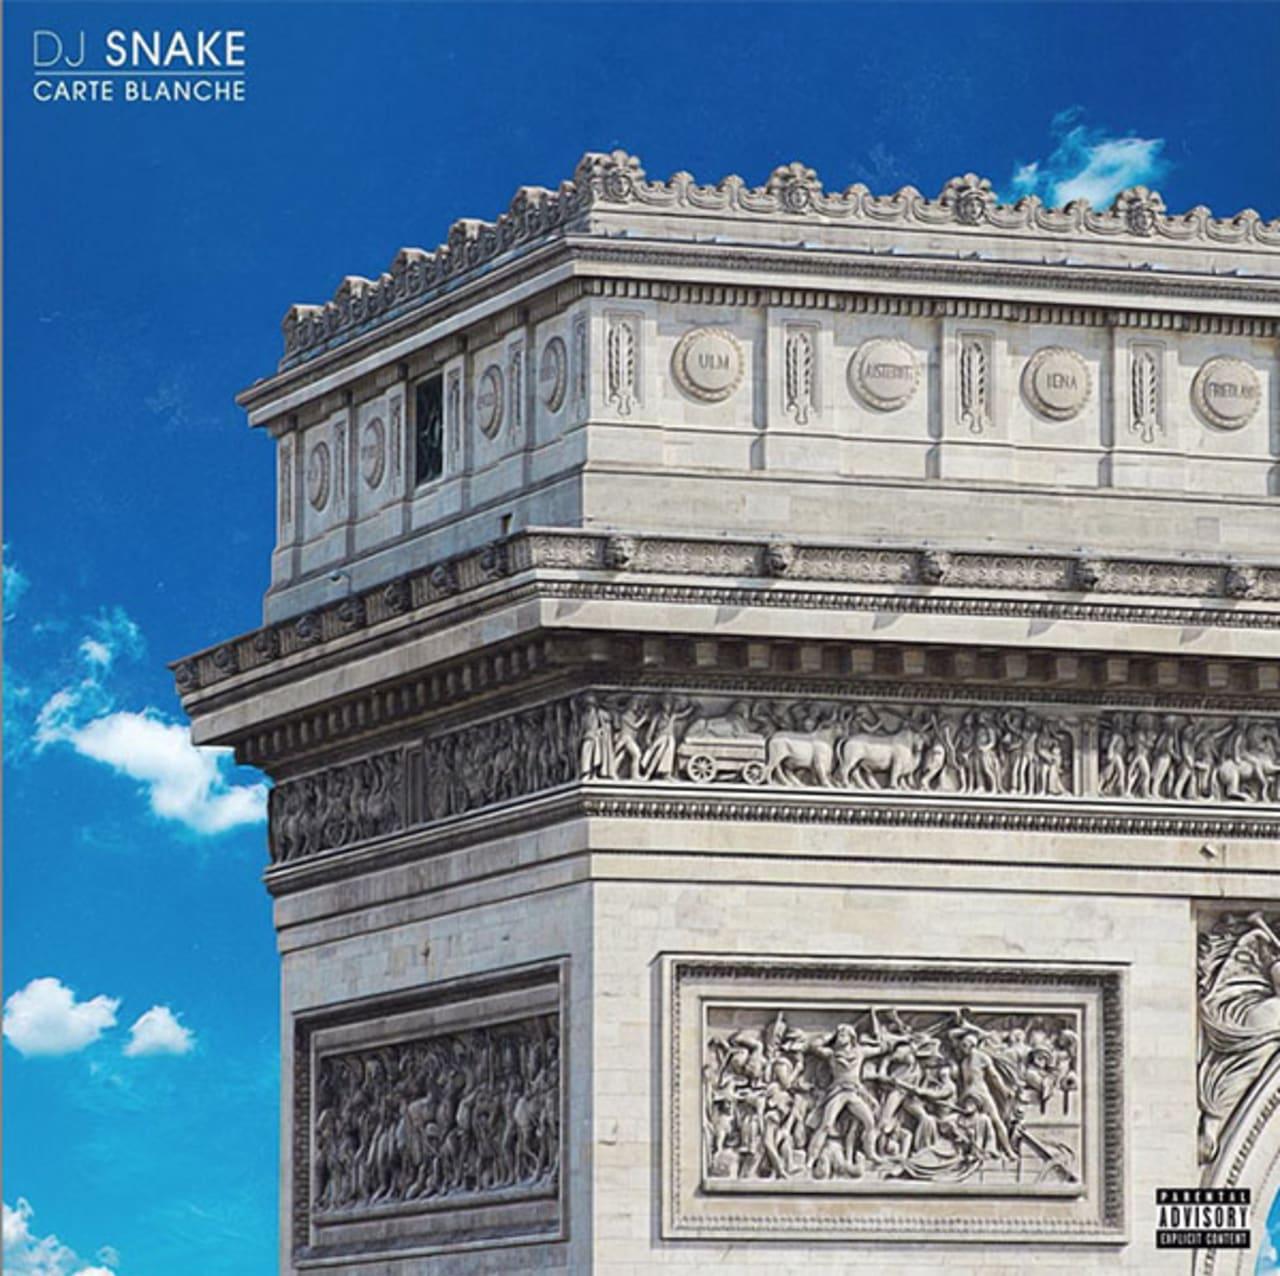 dj snake carte blanche Stream DJ Snake's New Album 'Carte Blanche' f/ Cardi B, Offset